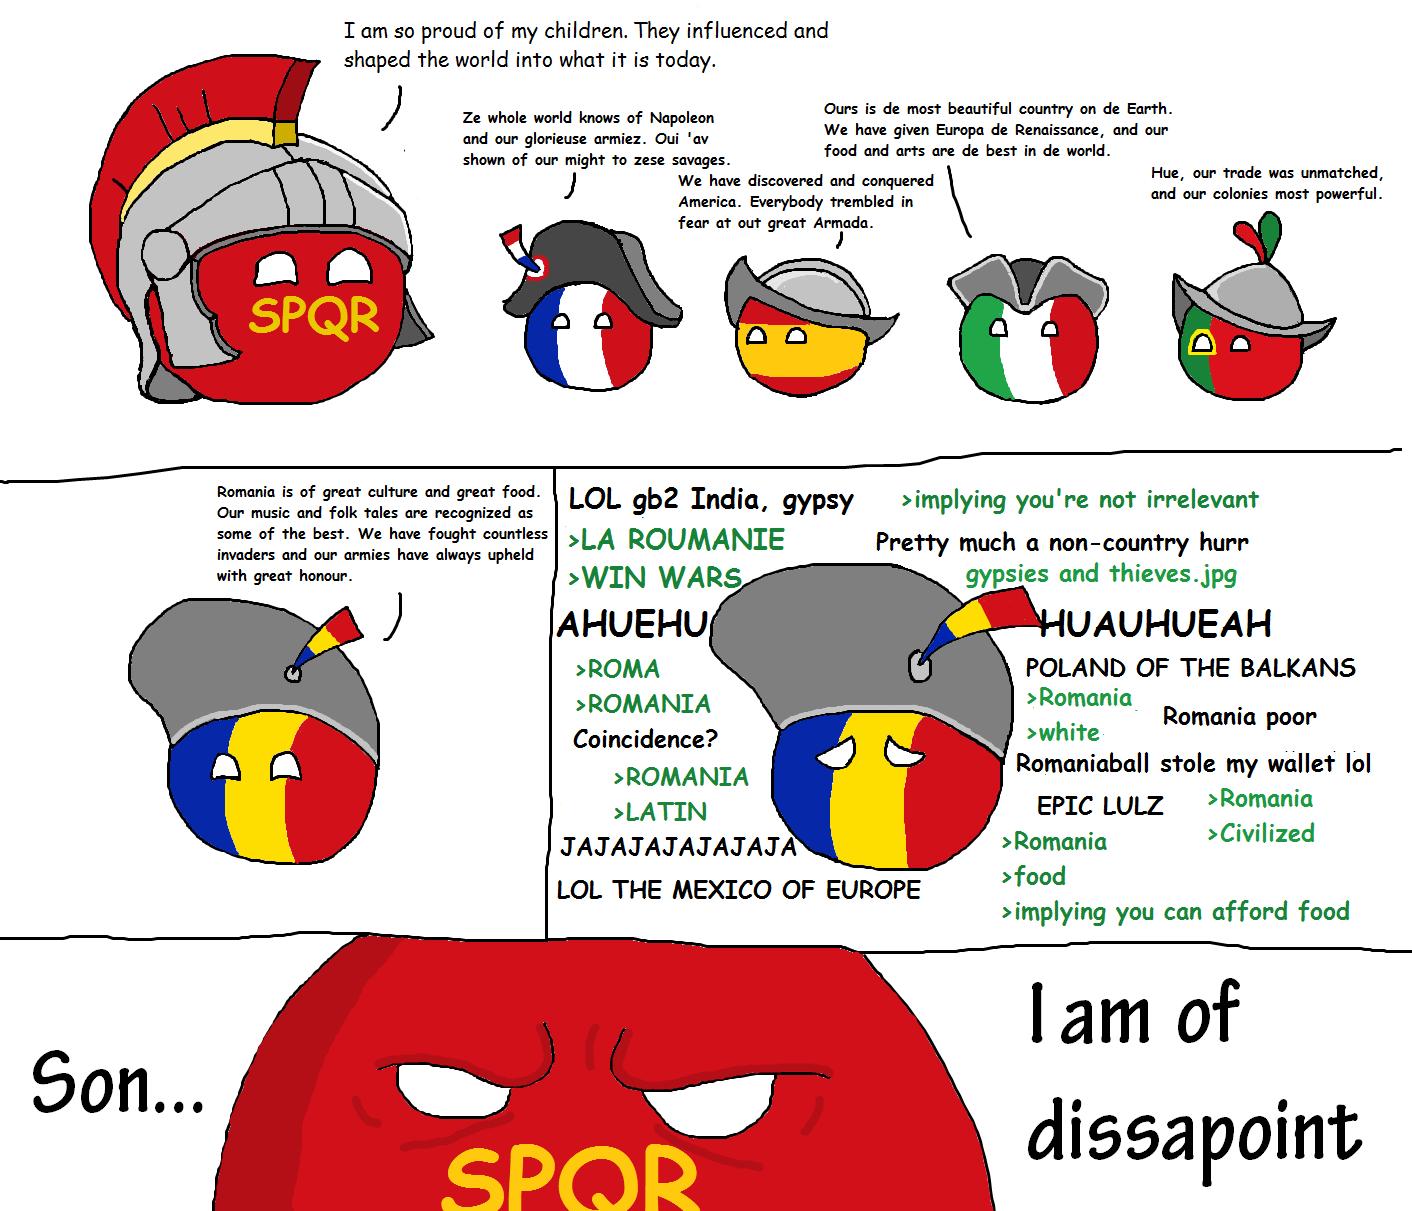 Napoleonic Era and Timeline